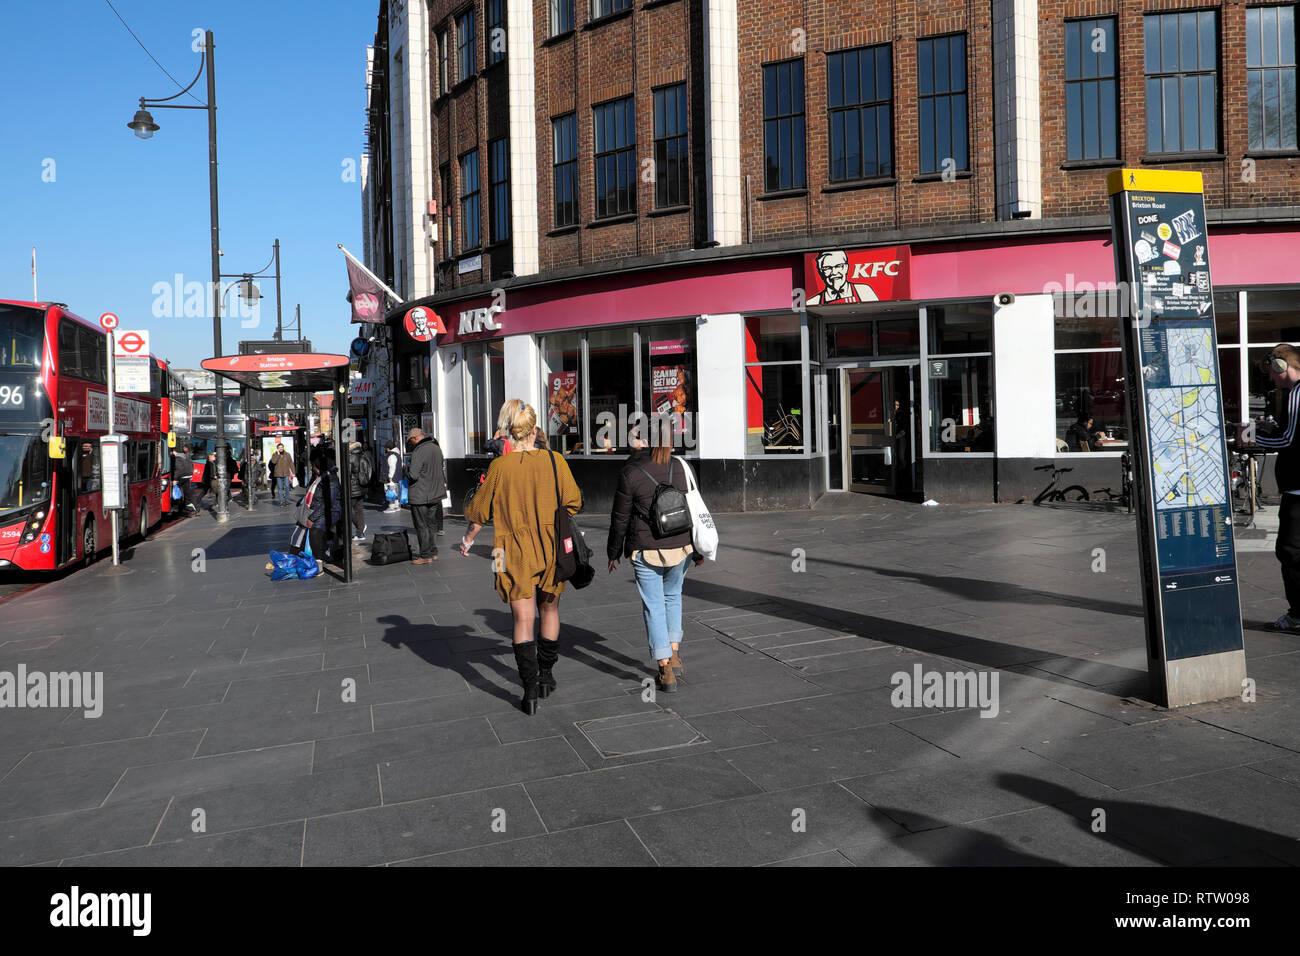 Rear view of women walking past KFC Kentucky Fried Chicken restaurant on Brixton Road in Brixton, Borough of Lambeth, South London UK   KATHY DEWITT - Stock Image